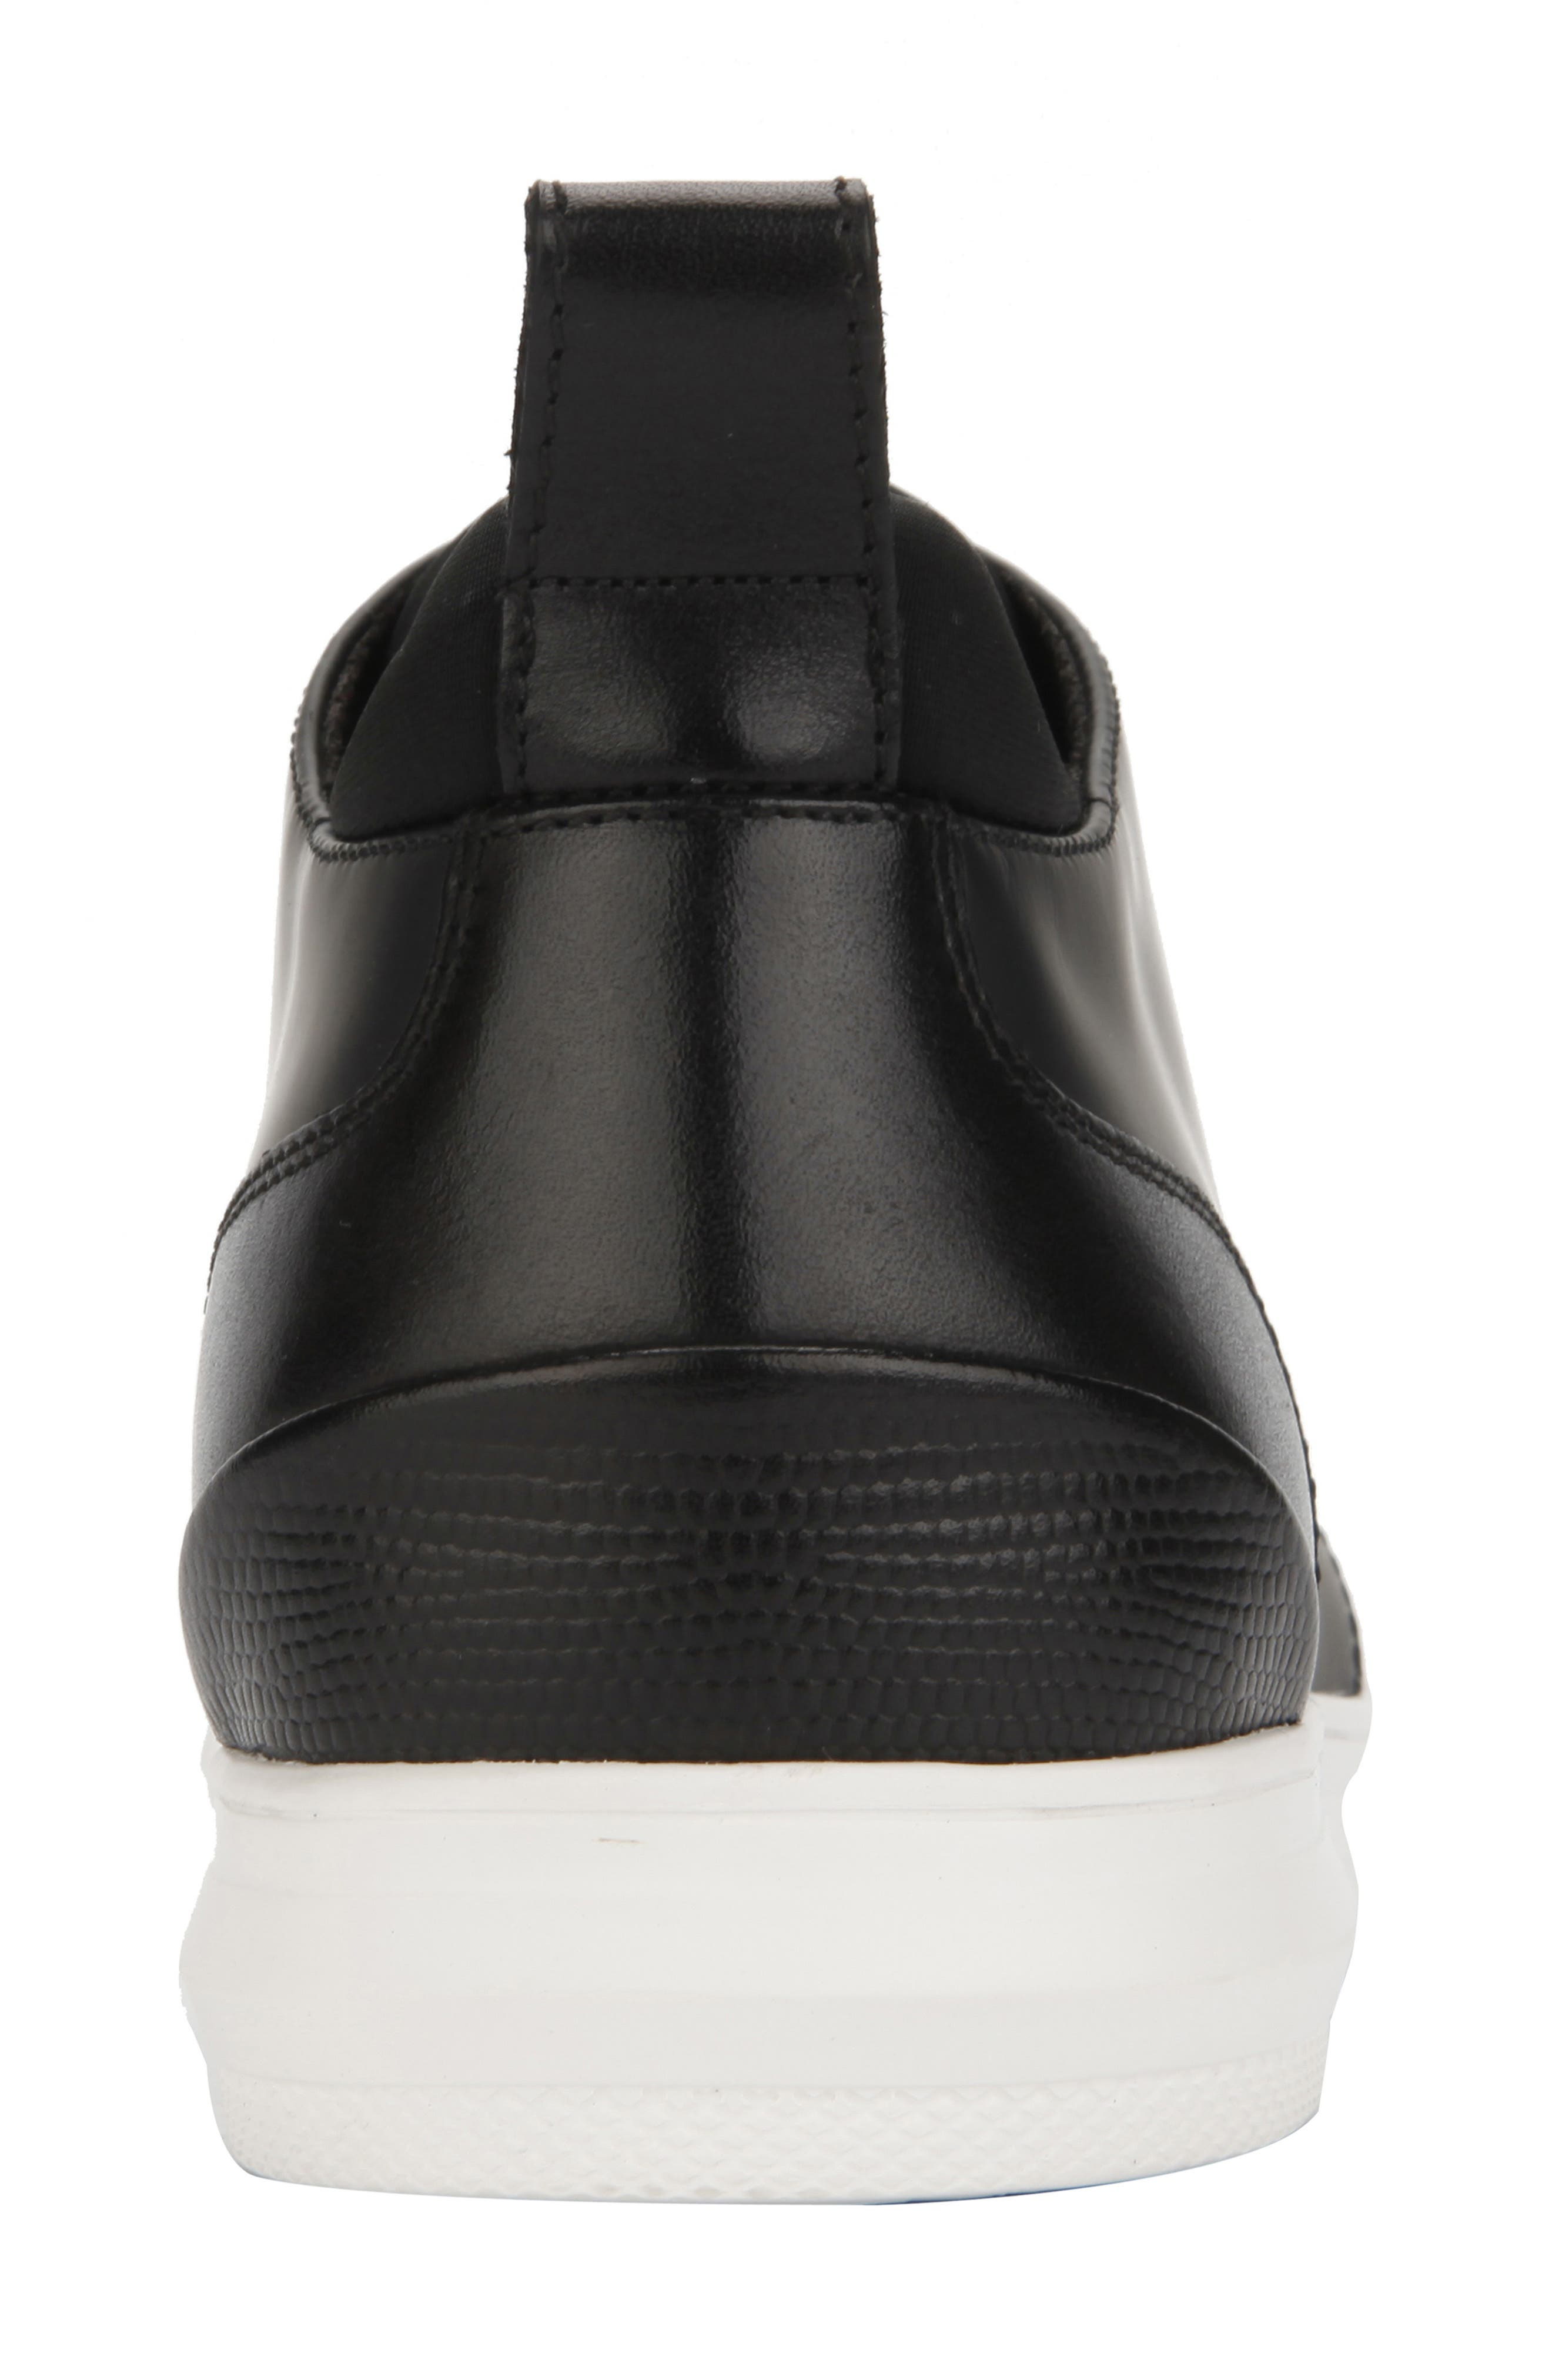 REACTION KENNETH COLE, Reemer Chukka Sneaker, Alternate thumbnail 5, color, BLACK